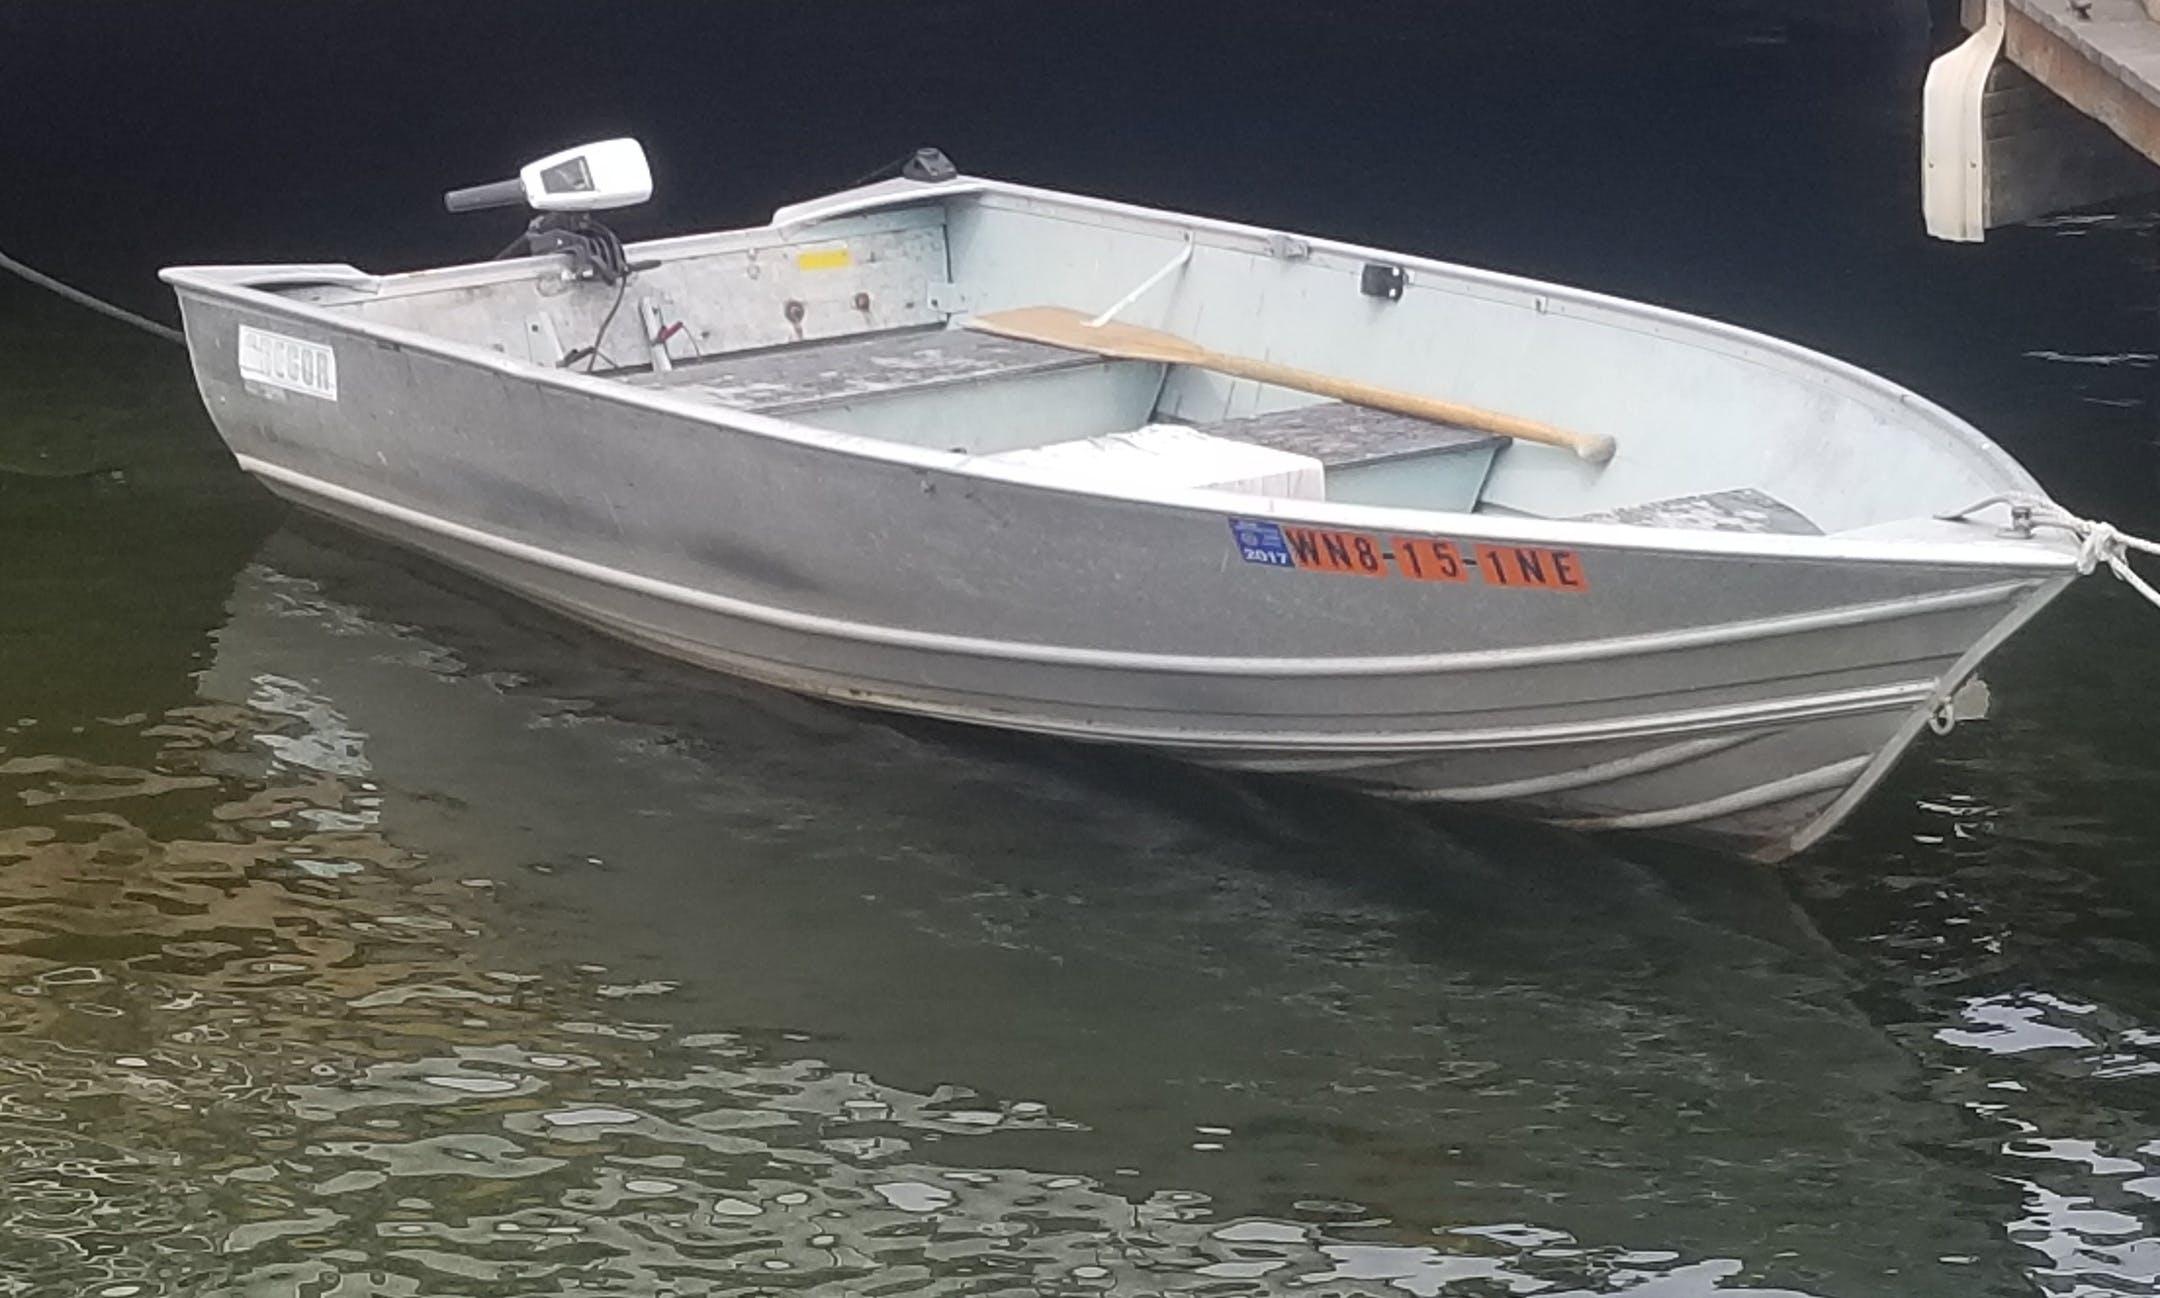 12' Gregor Aluminum Fishing Boat in Lake Stevens, Washington